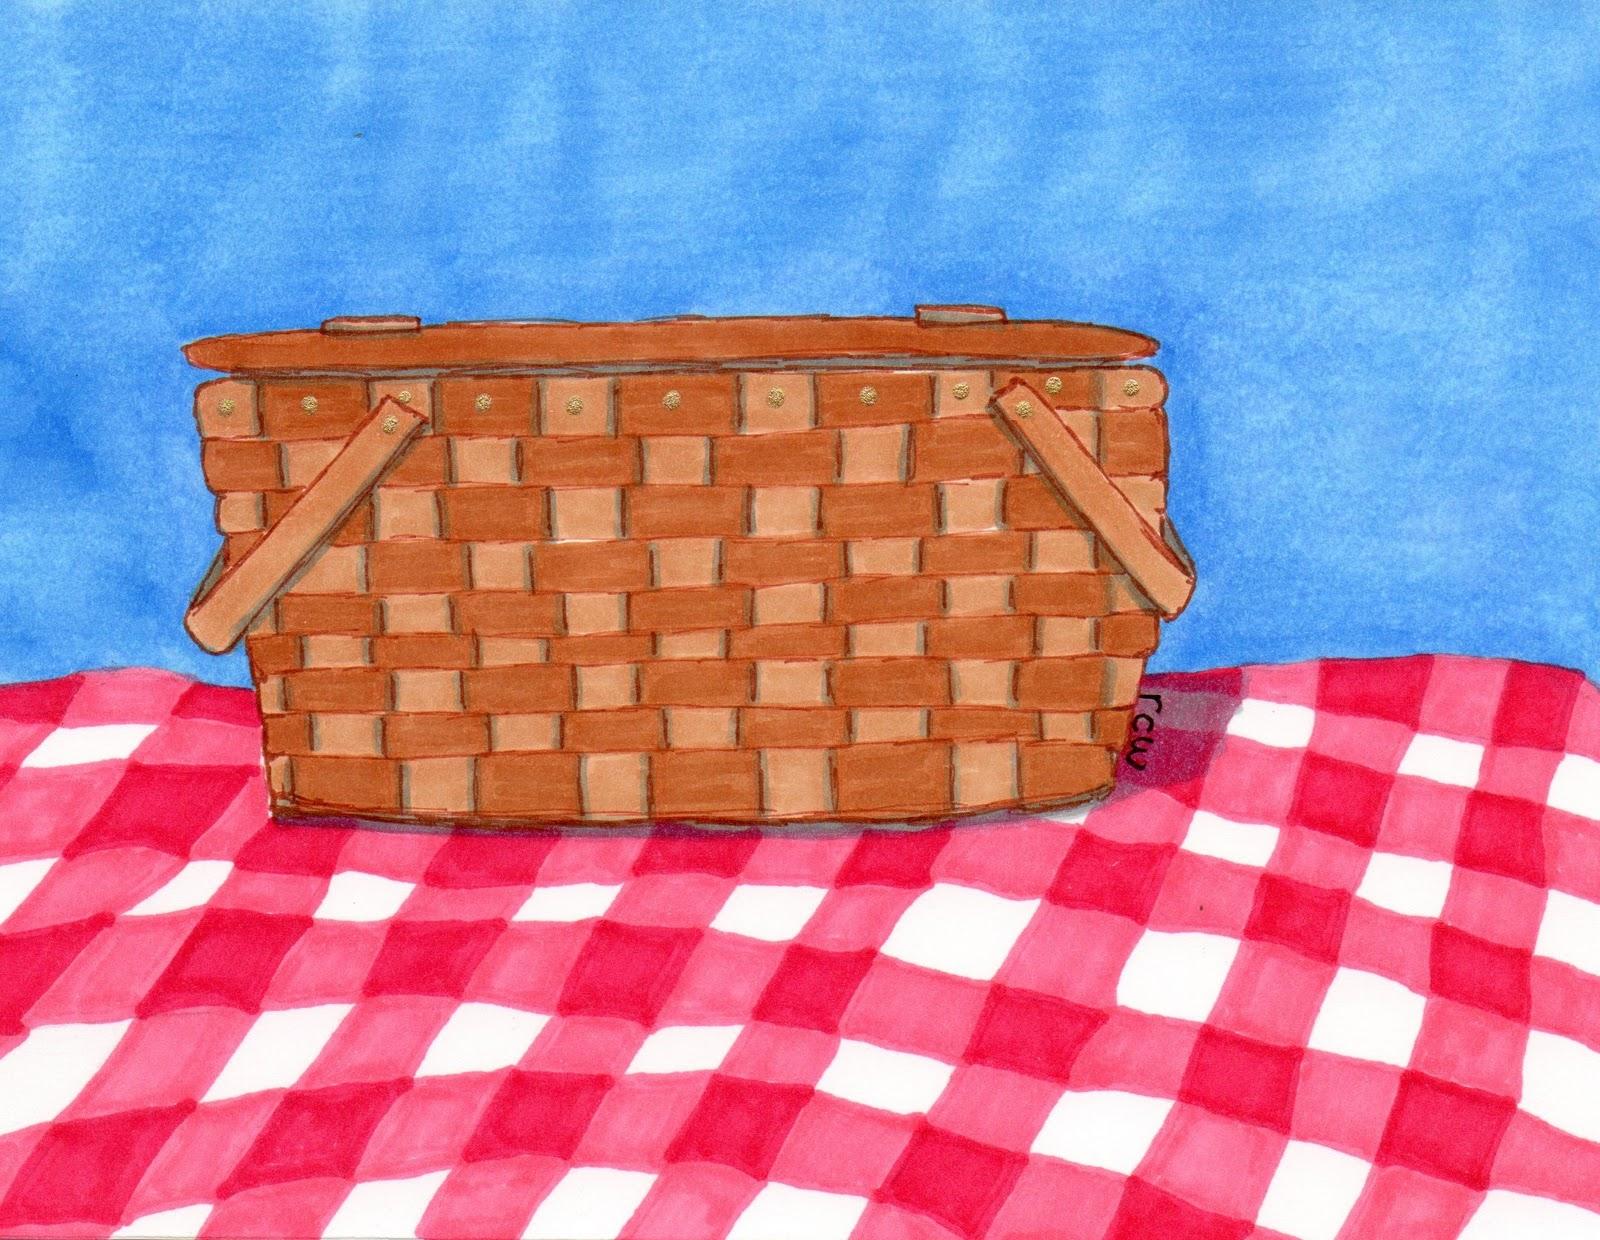 Drawing at getdrawings com. Blanket clipart picnic mat